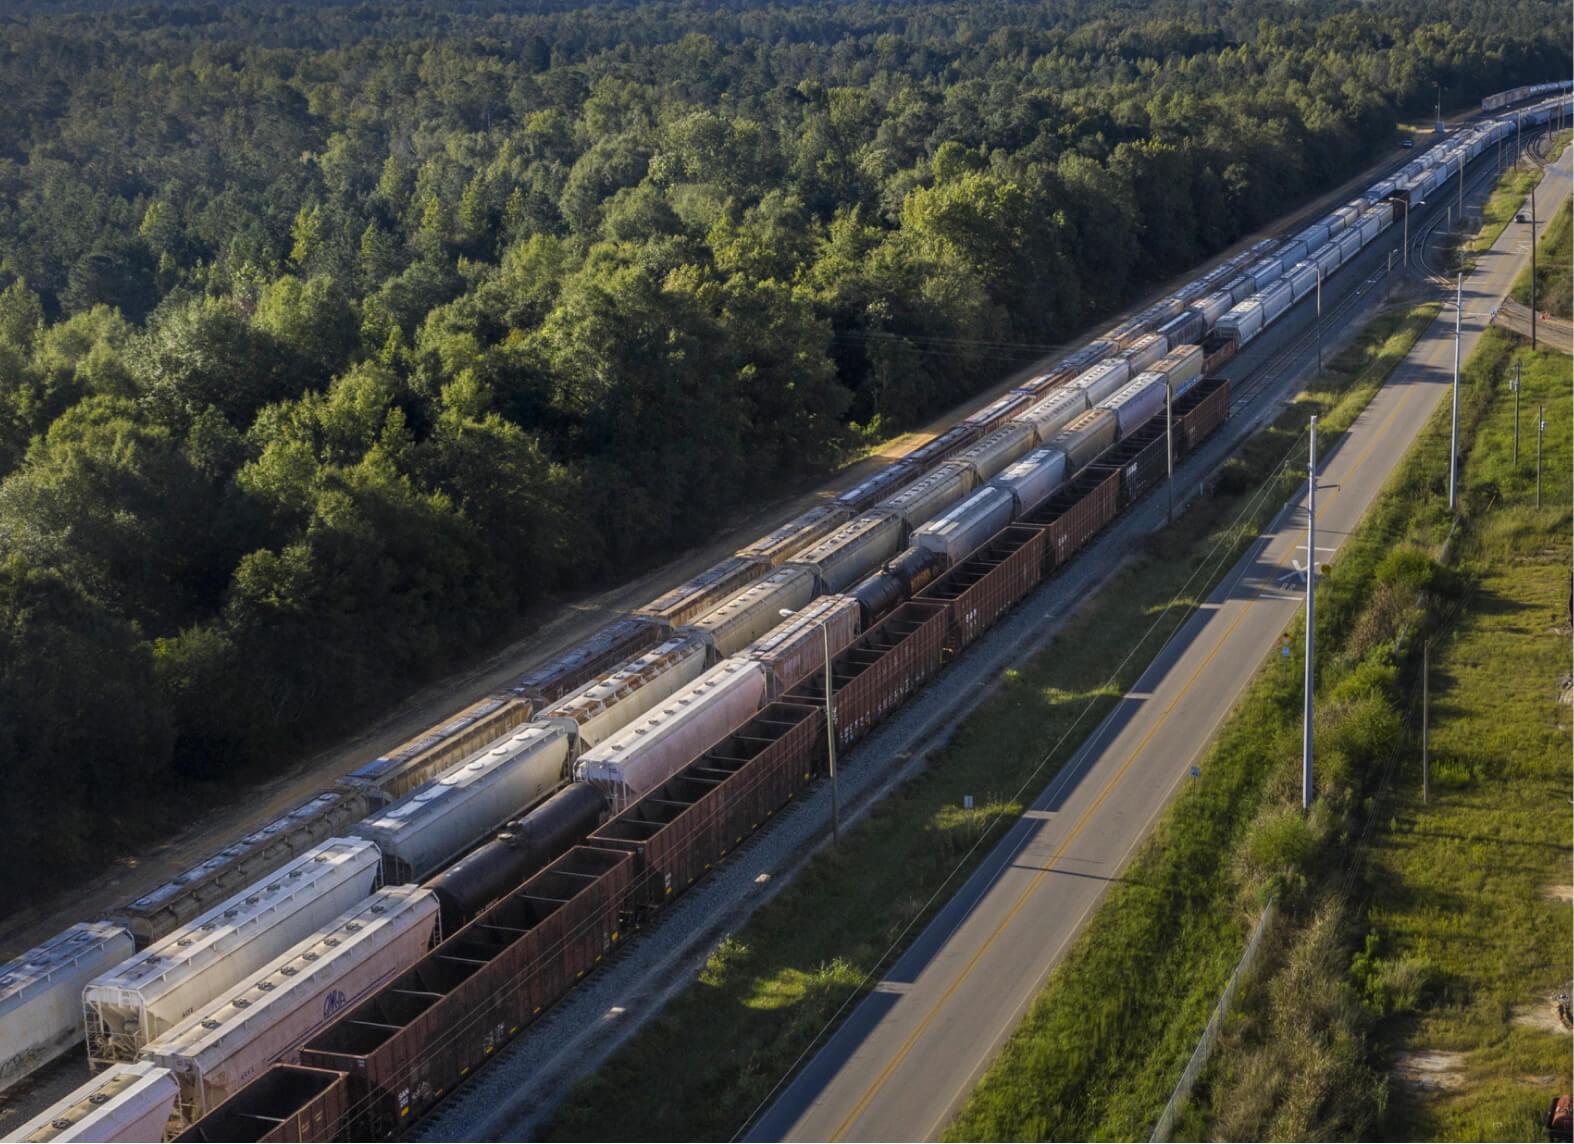 Sandersville Railroad Company storage